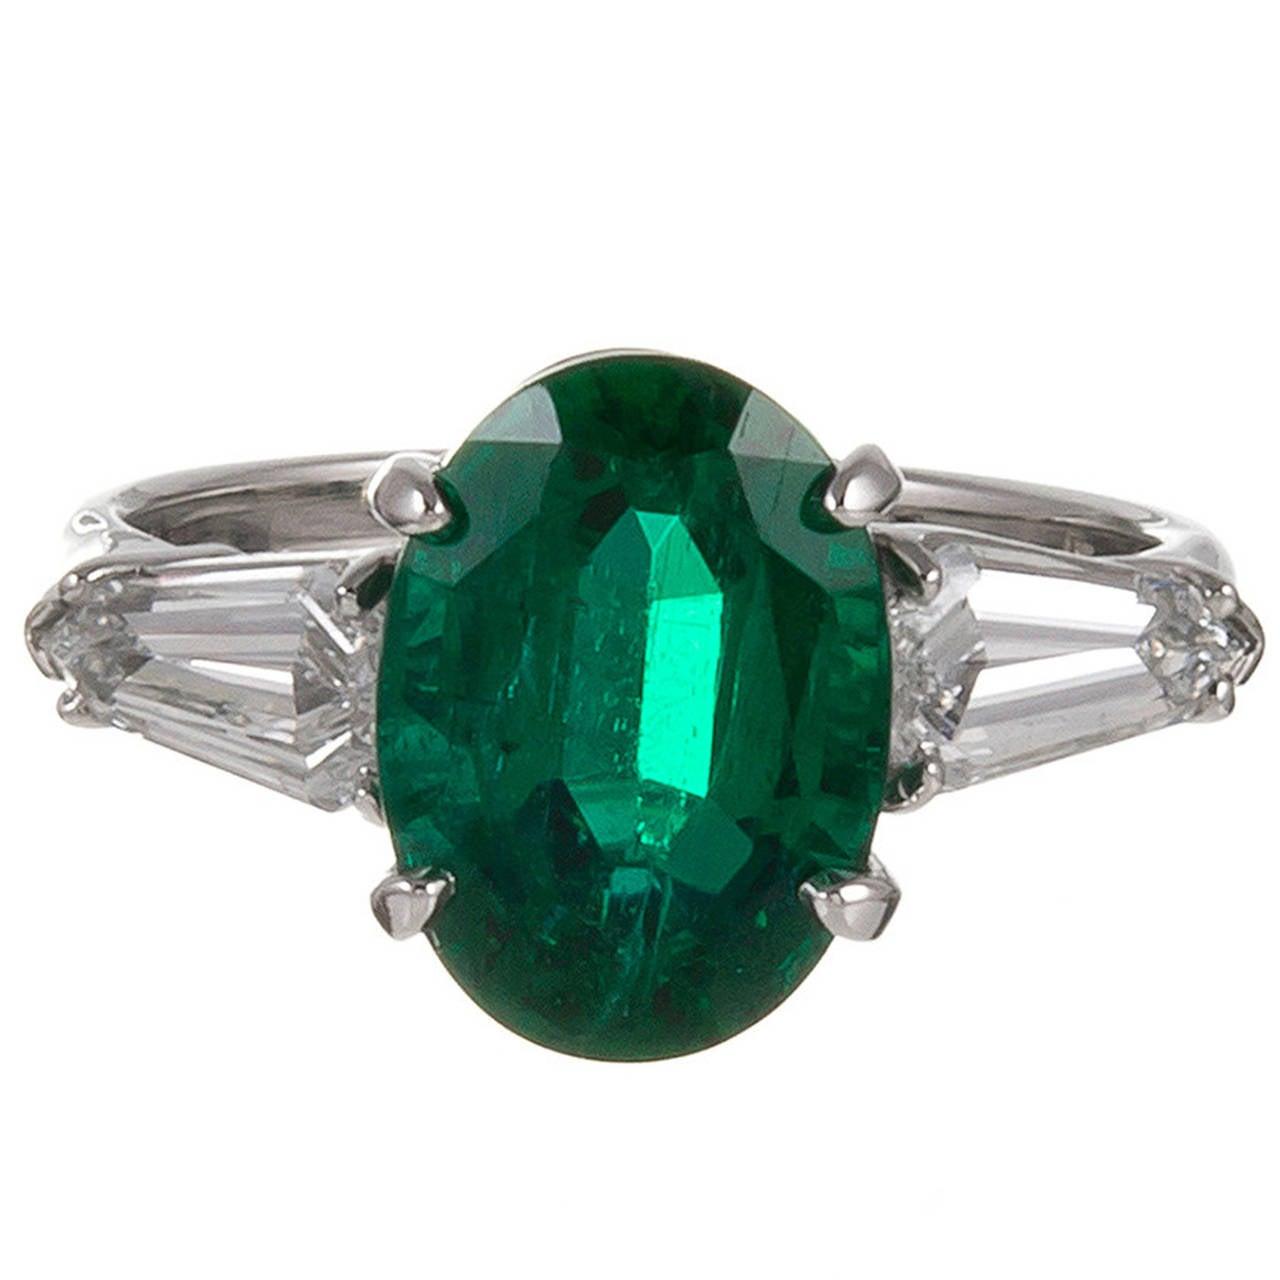 3 49 carat oval emerald kite shoulders